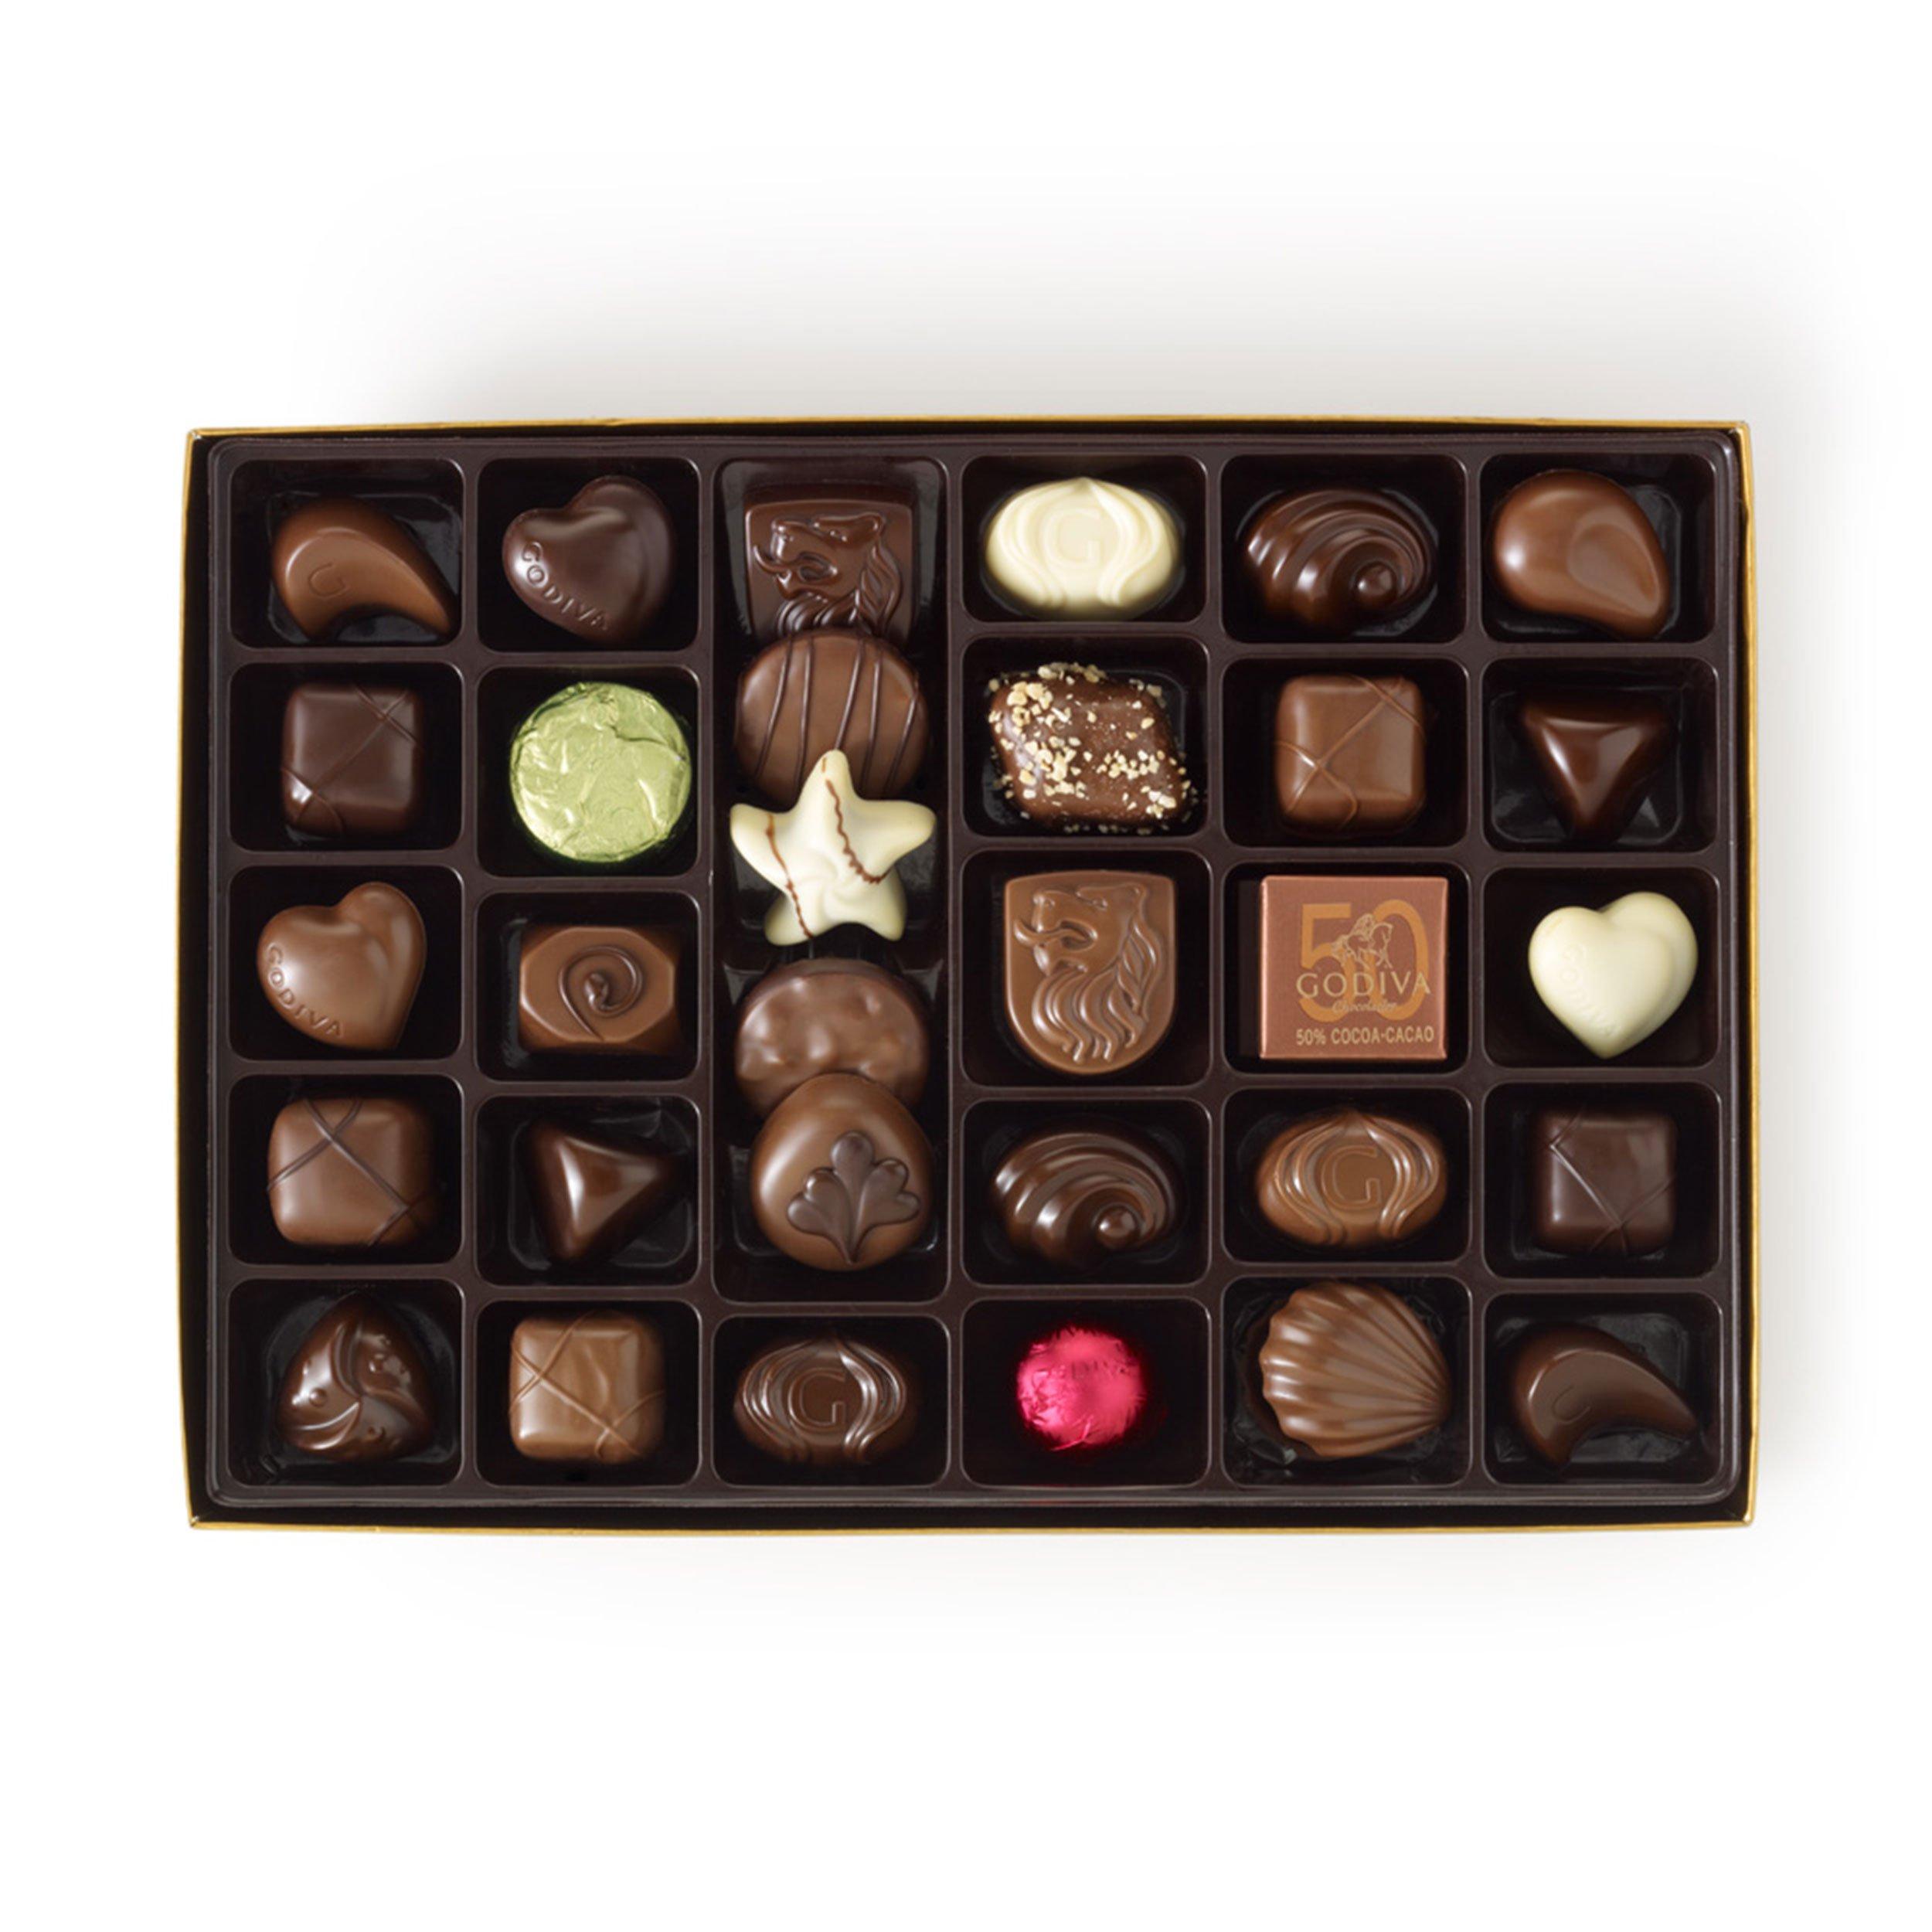 Godiva Chocolatier Gold Ballotin Assorted Gourmet Chocolates 36 Piece Gift Box, Great for Gifting by GODIVA Chocolatier (Image #3)